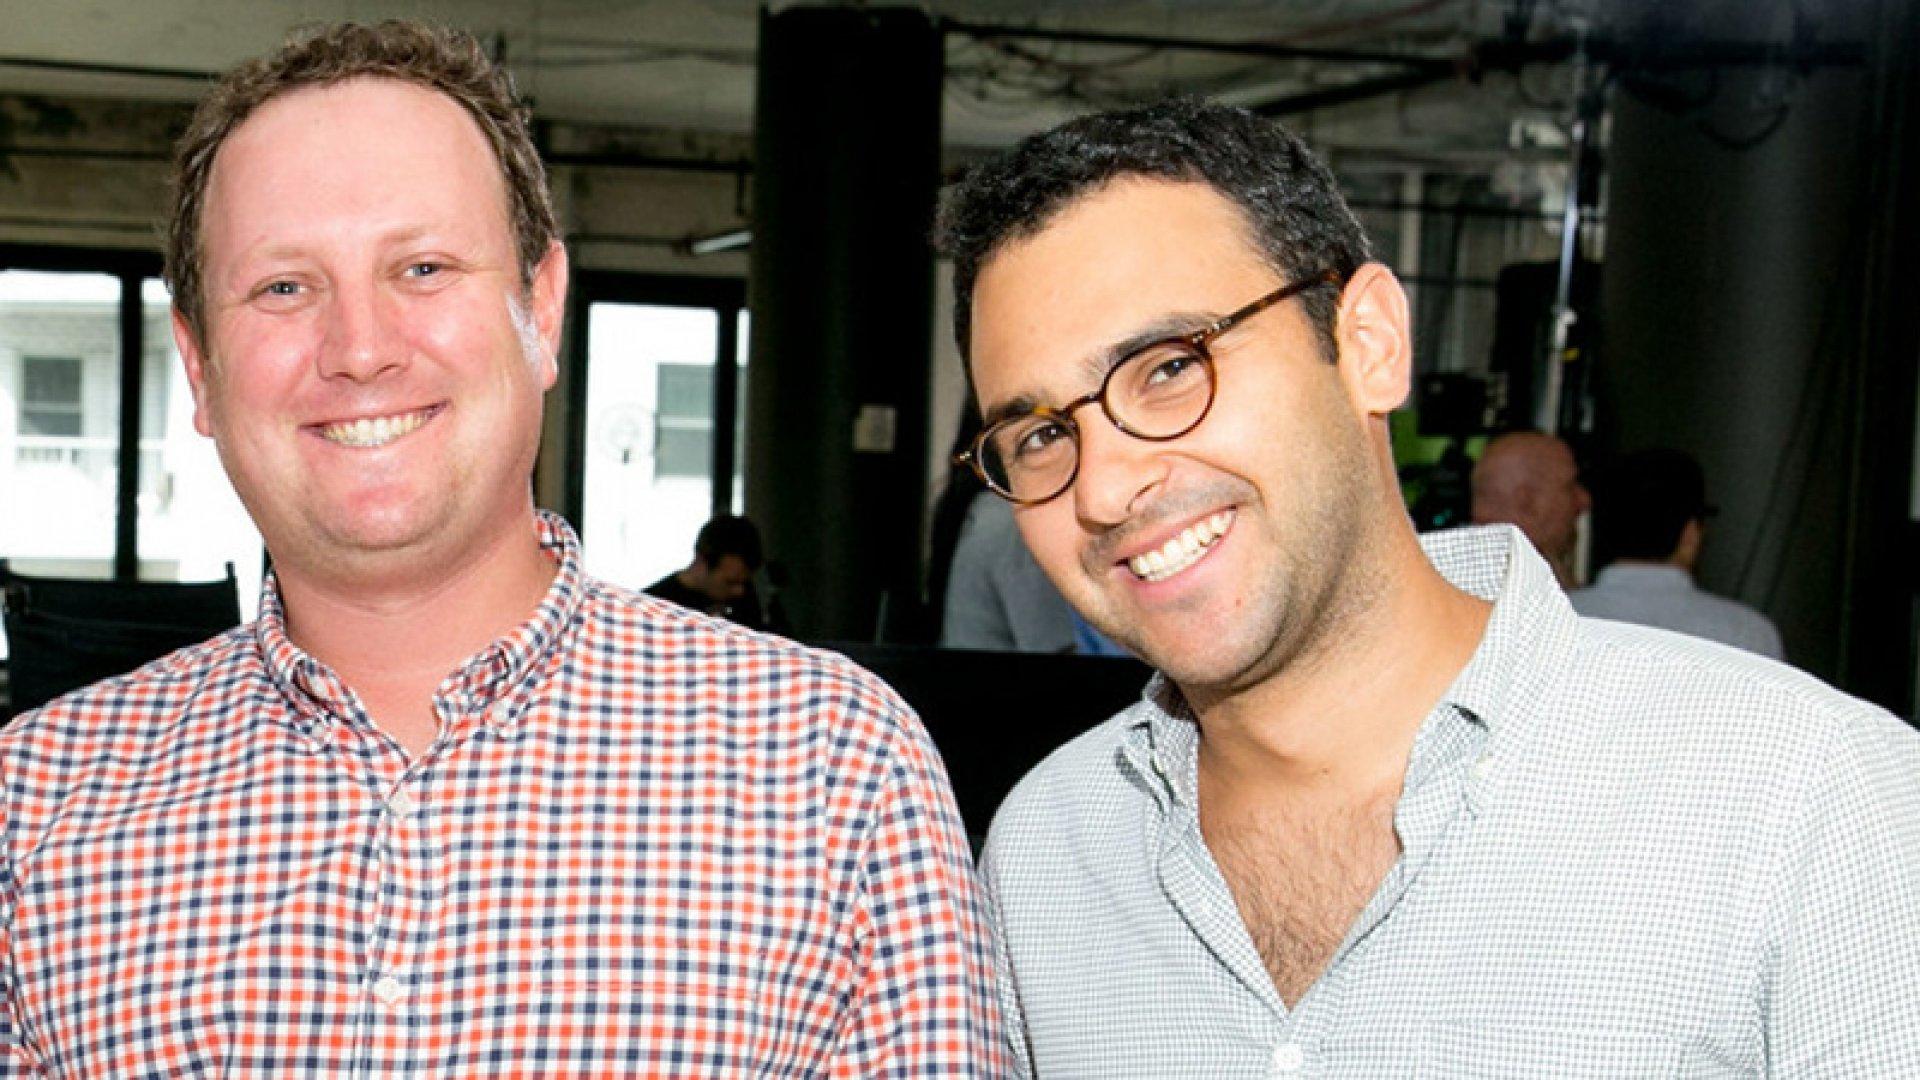 Brat co-founders Darren Lachtman (left) and Rob Fishman.